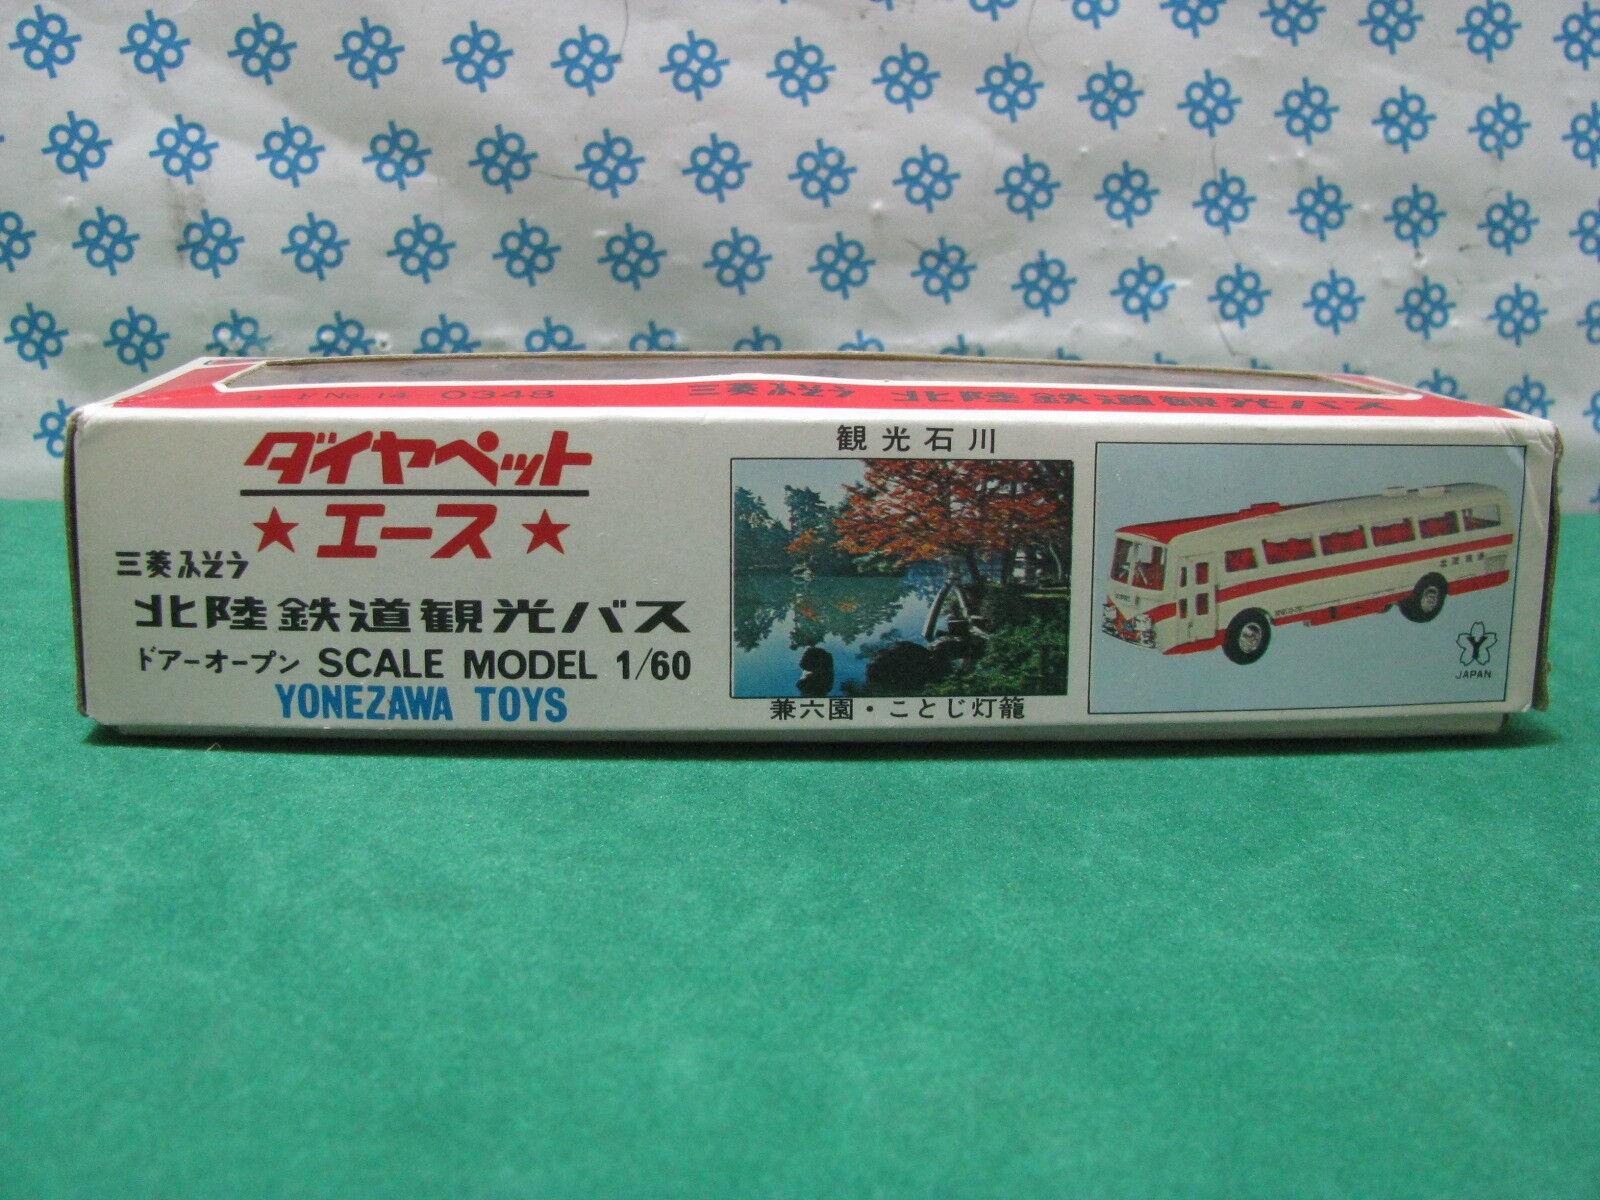 SCATOLA   BOX  per for    DIAMOND pet BUS  14-0348   - 1 60 Diapet - Yonezawa T 5d1b81